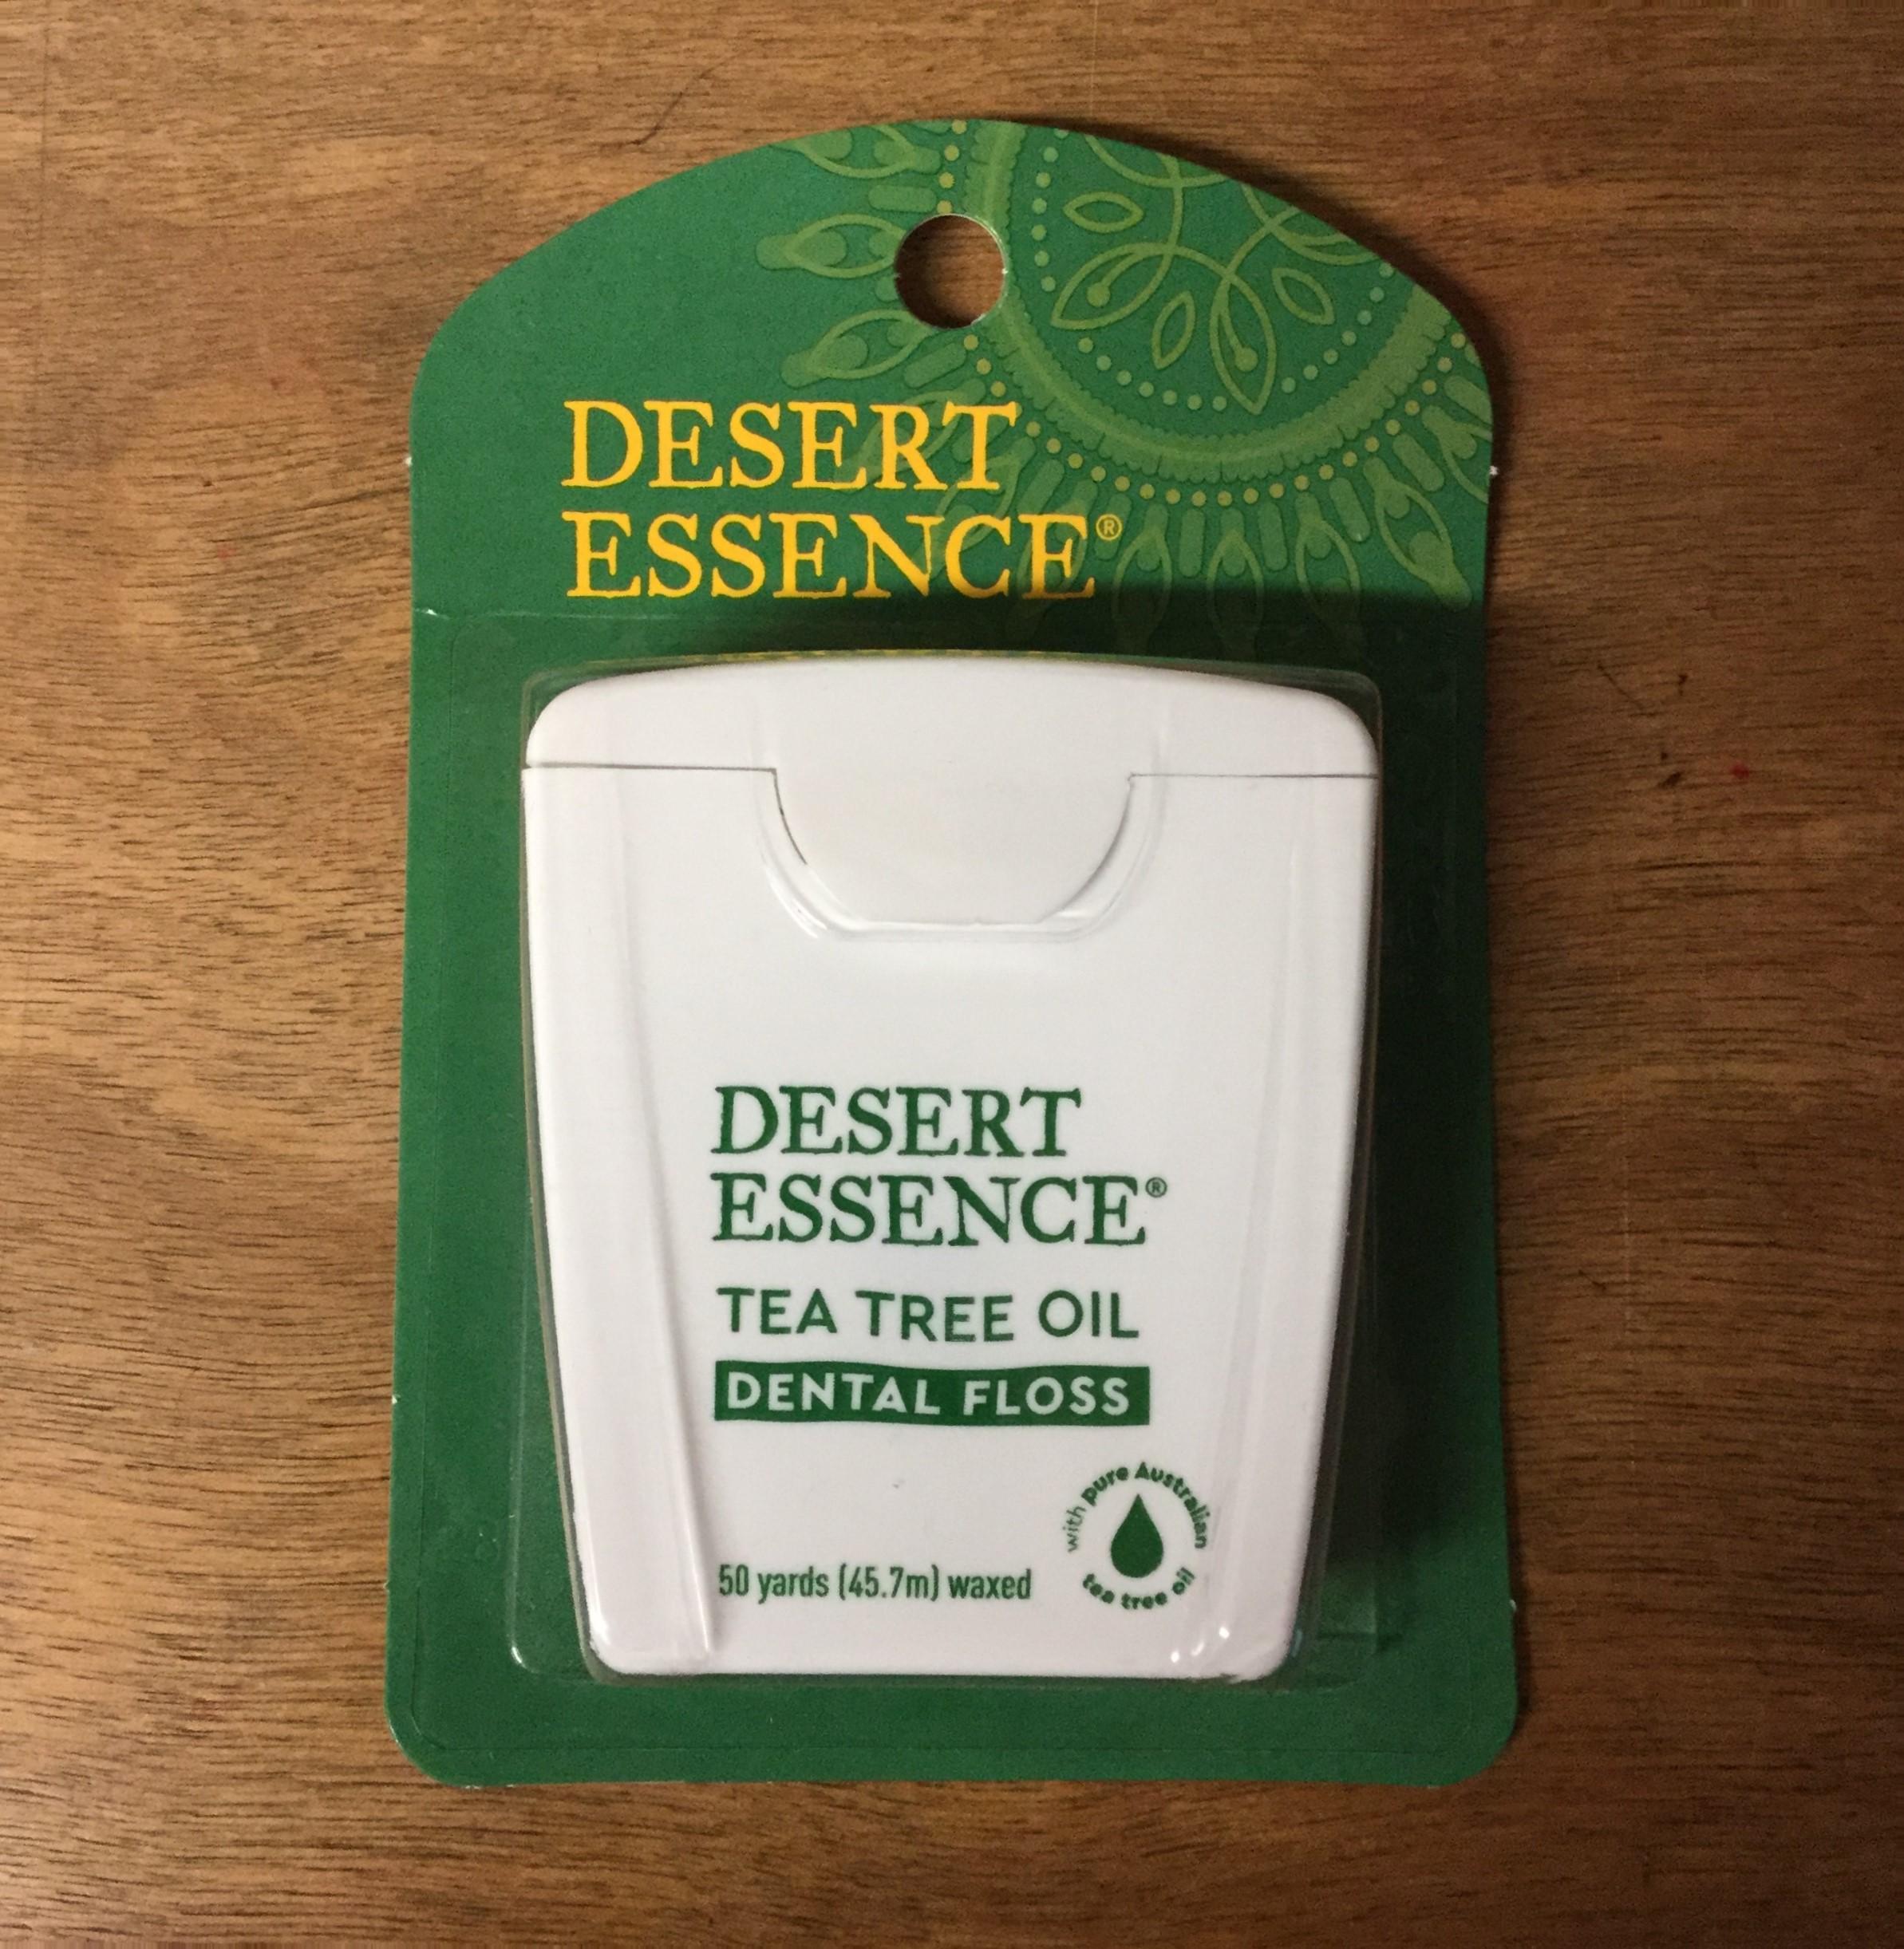 Desert Essence Dental Floss, Waxed Tea Tree Oil